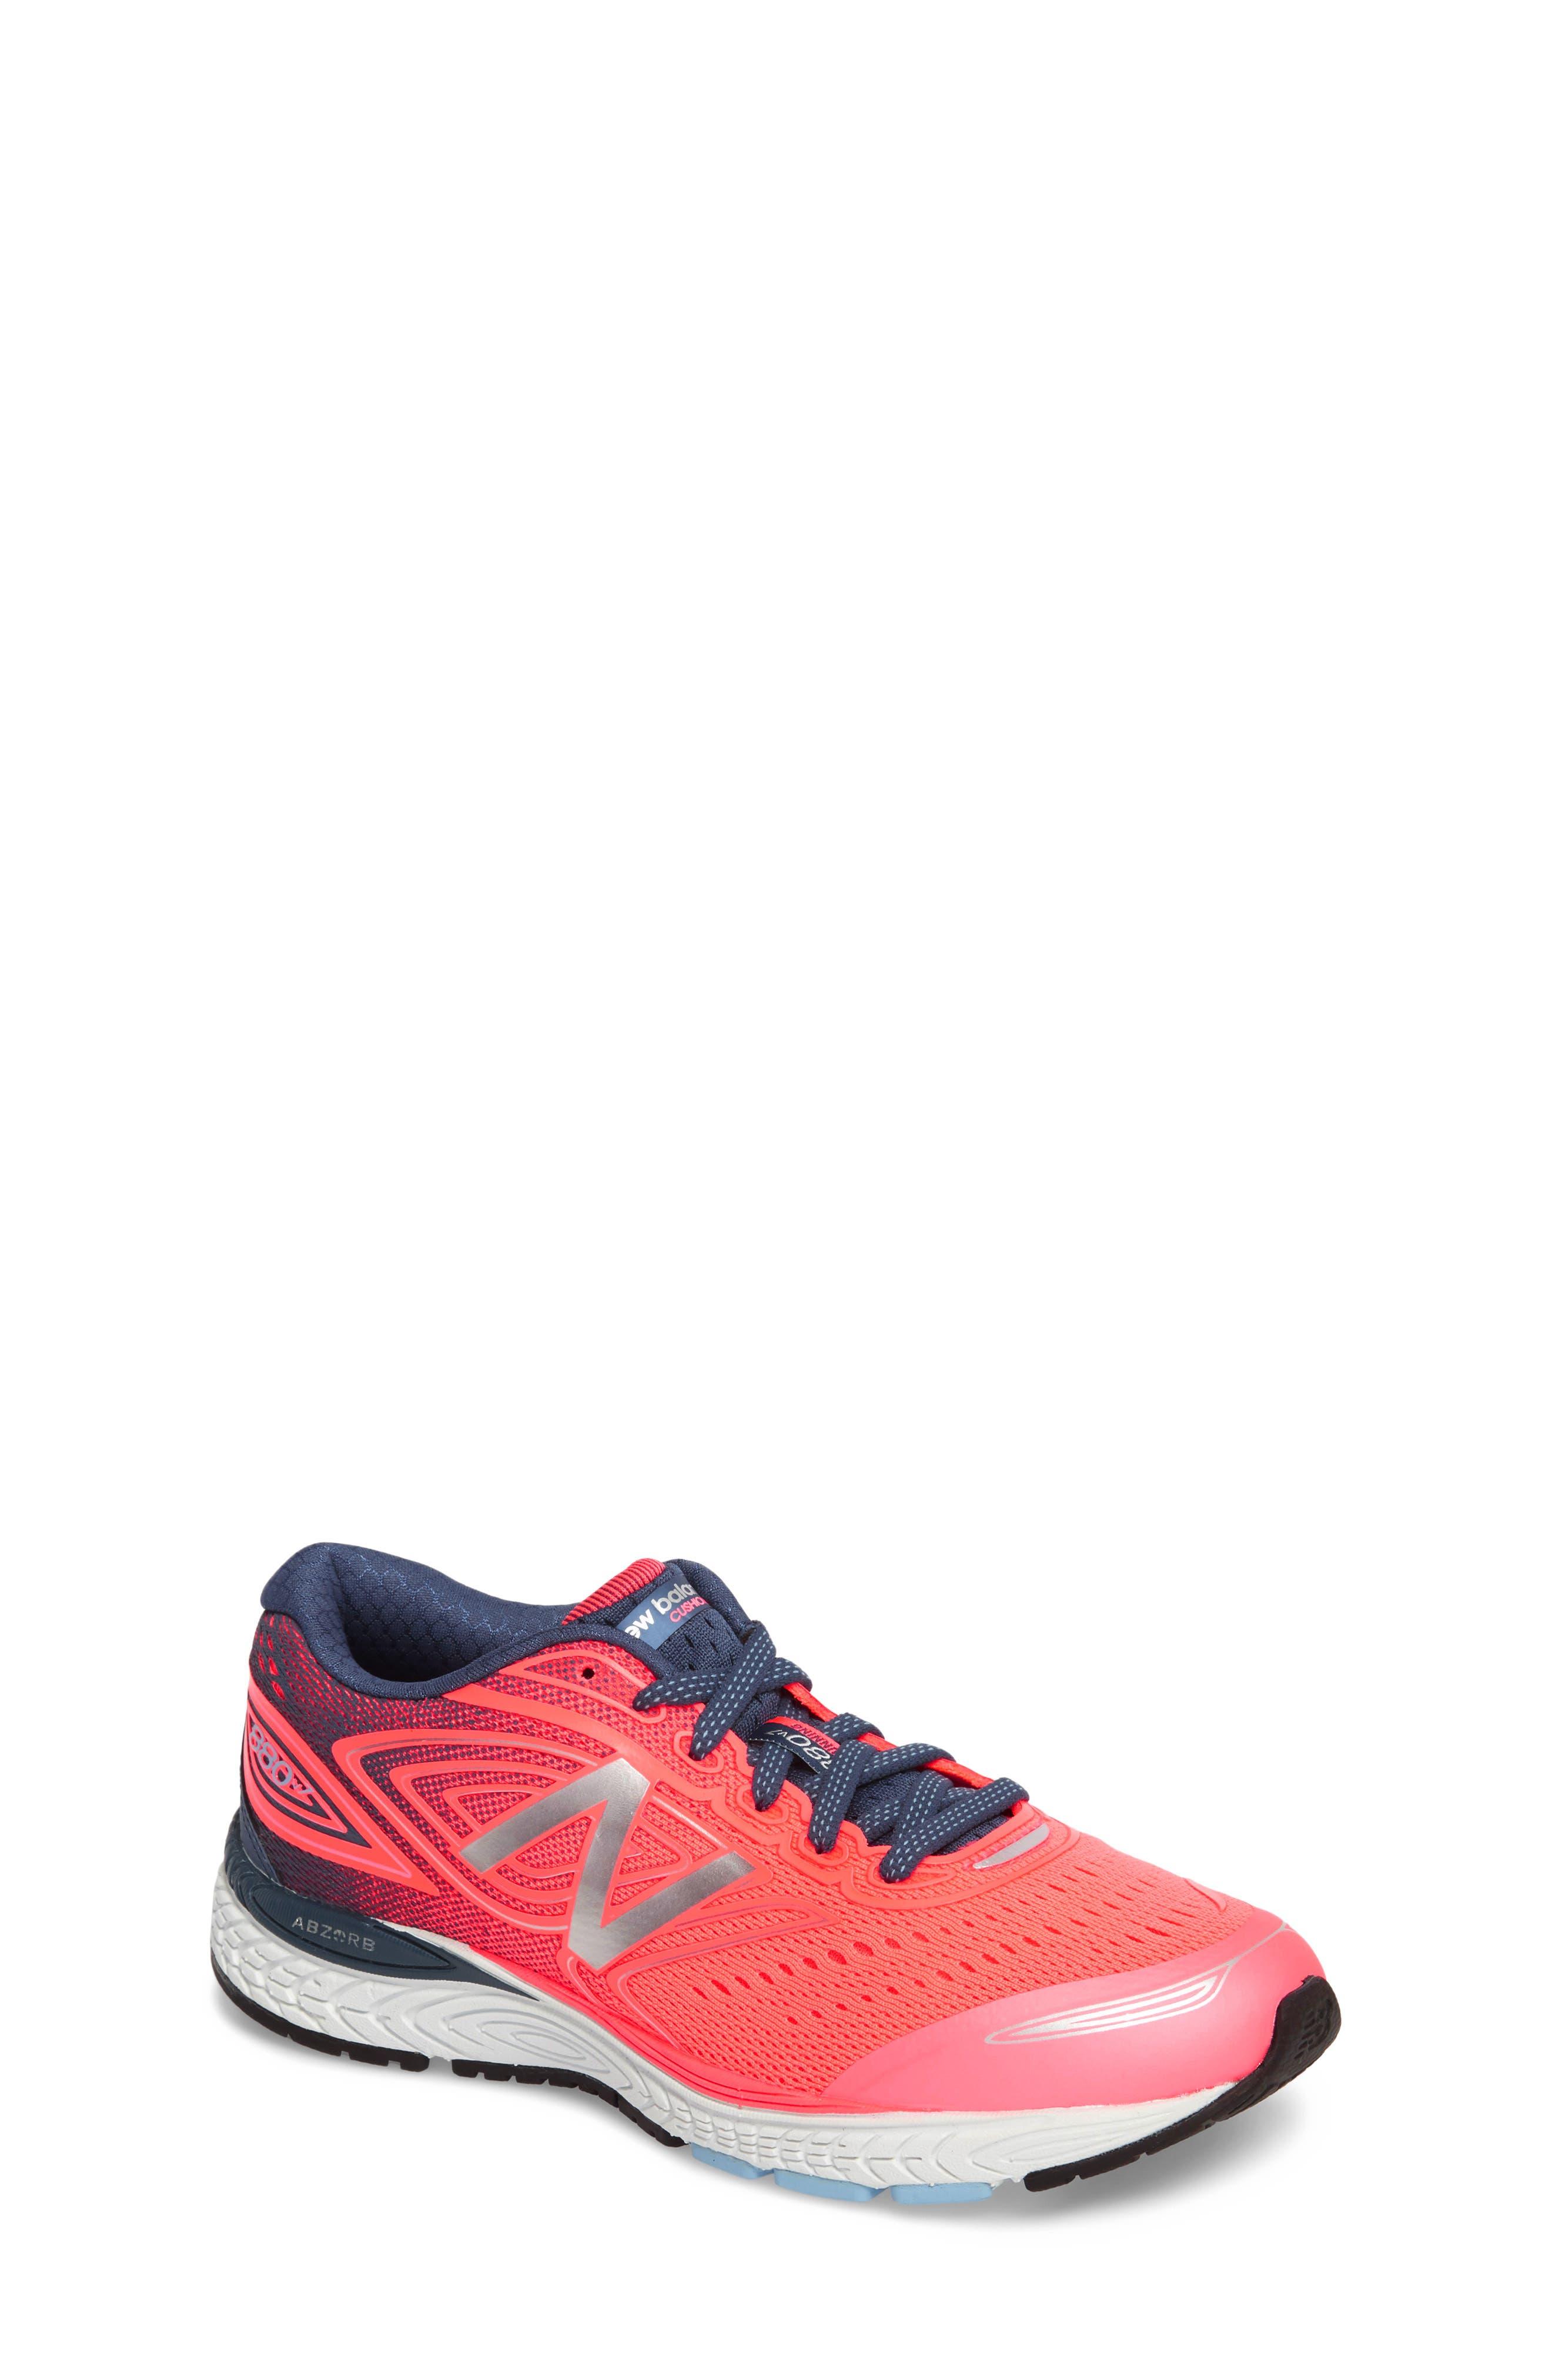 880v7 Sneaker,                         Main,                         color, Guava